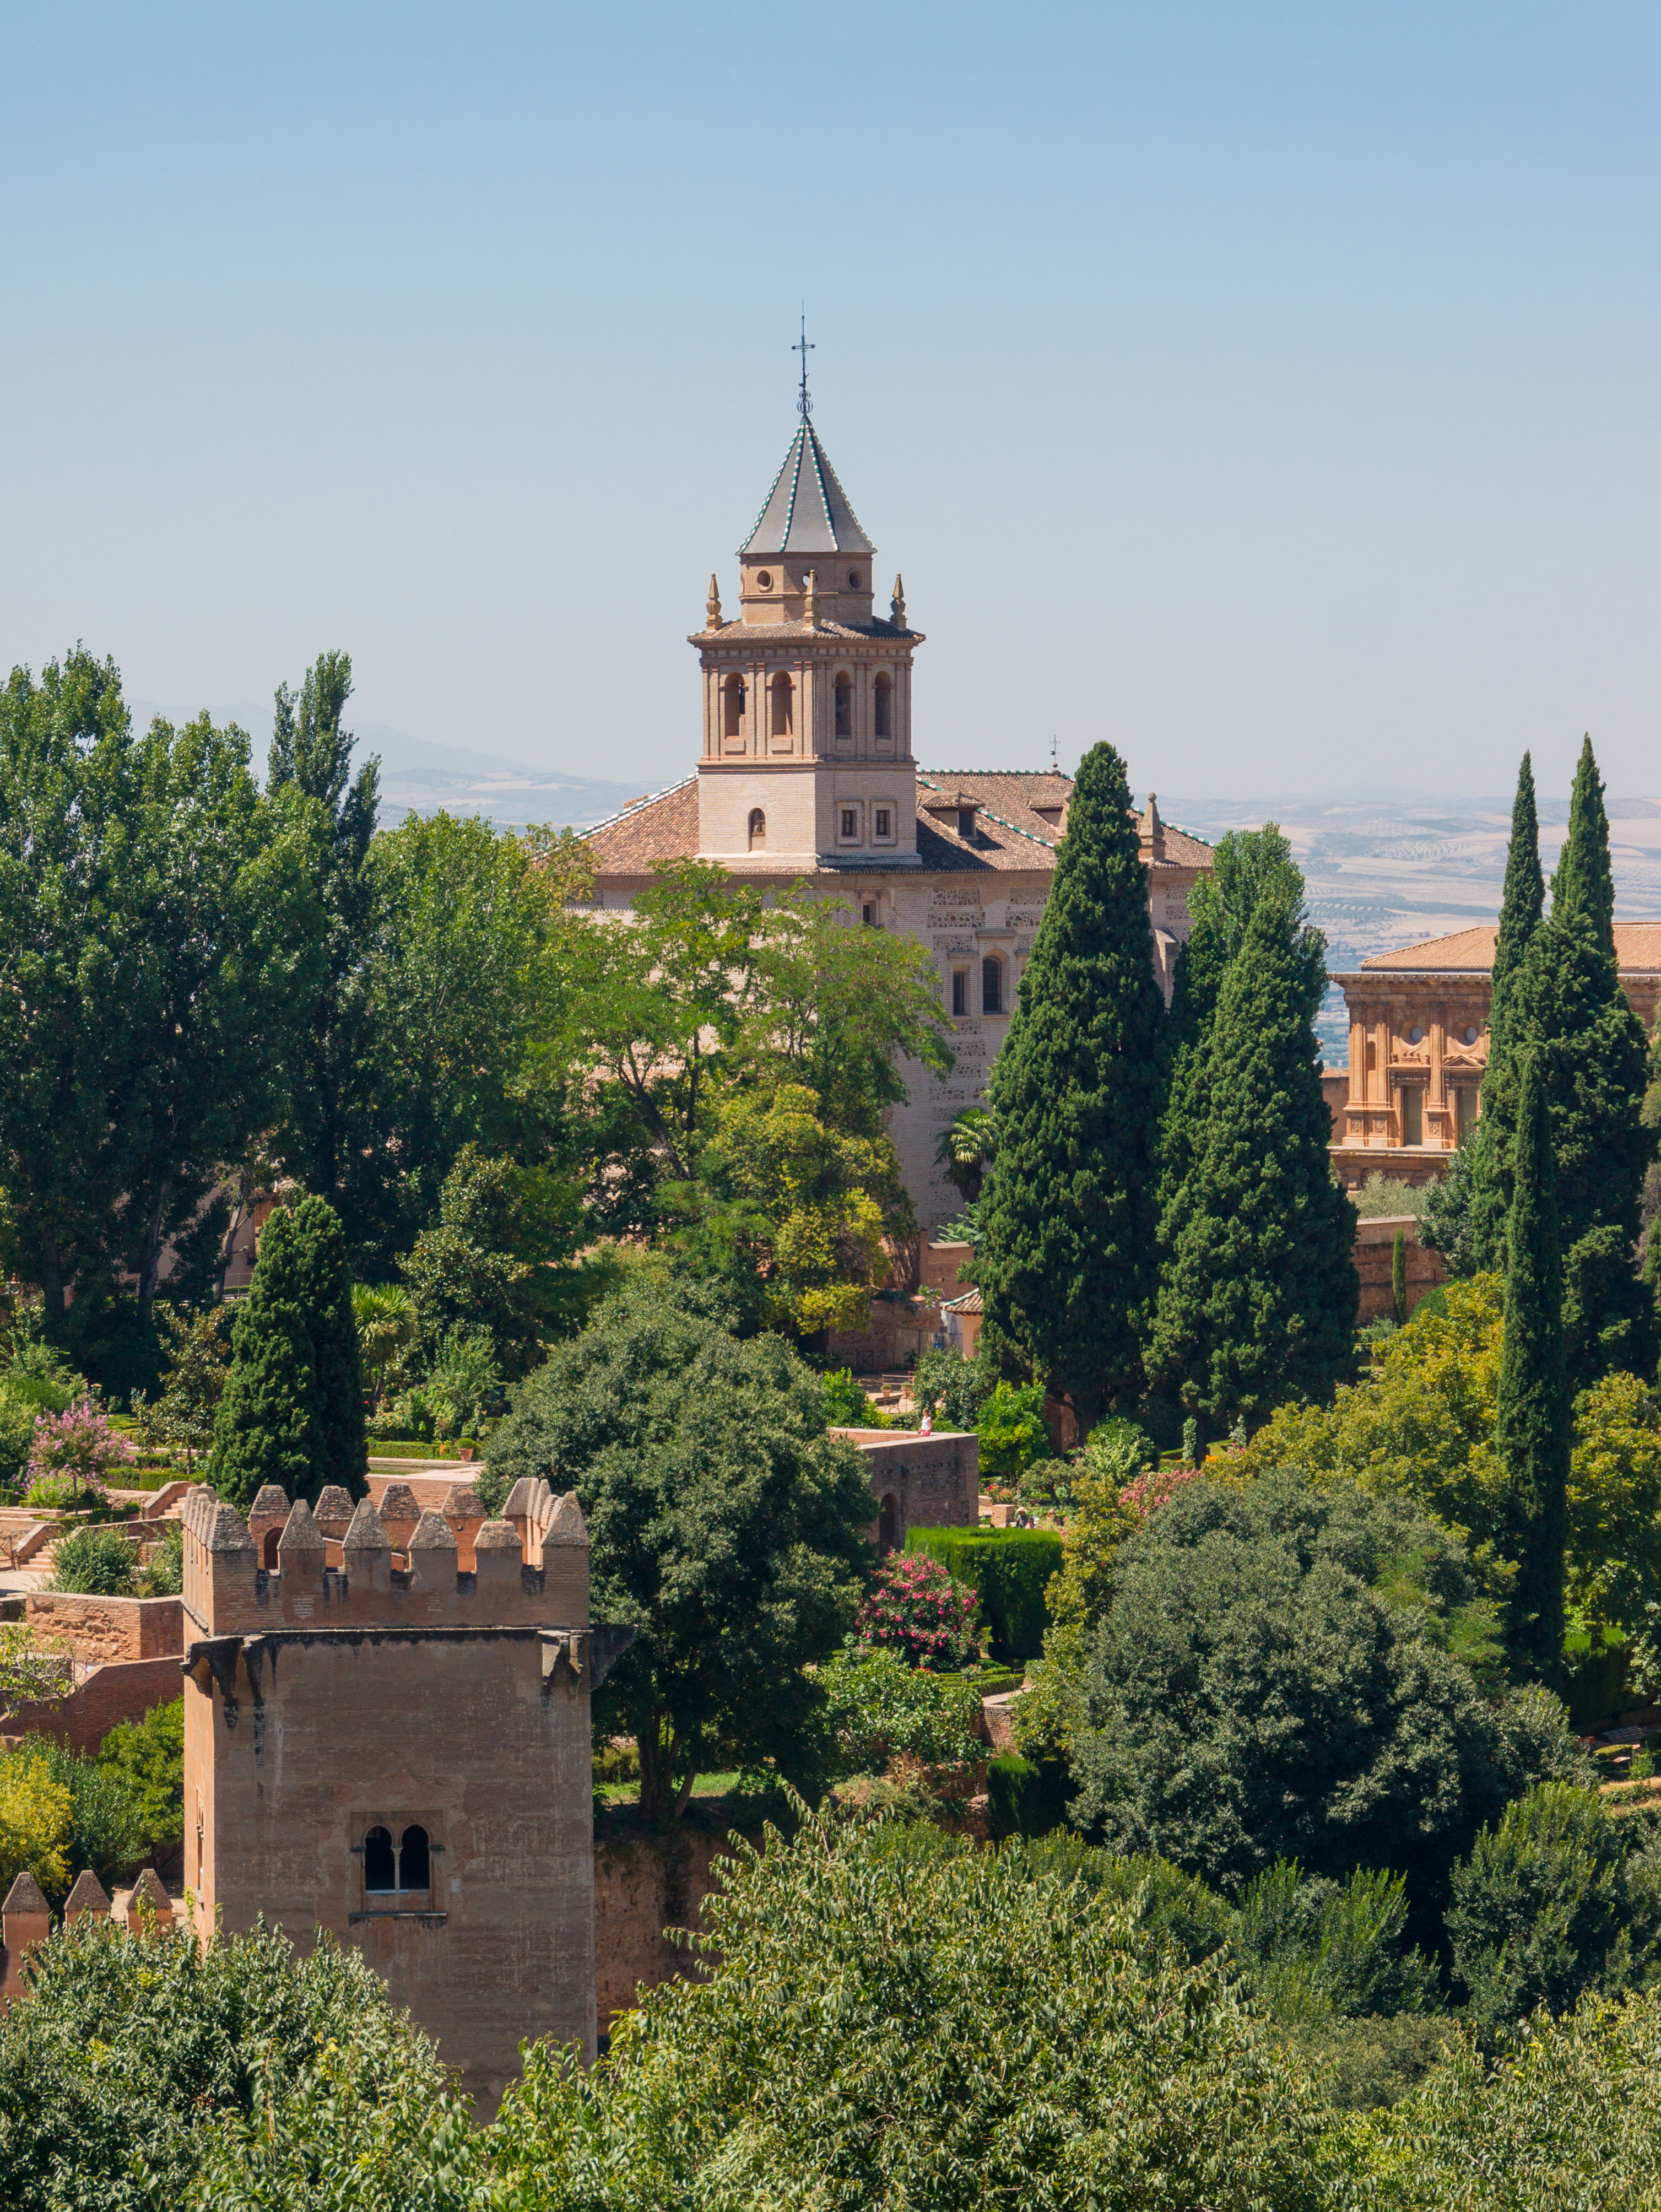 What Is Life 360 >> File:Santa Maria de la Alhambra, tower of the captive lady, from Generalife, Granada, Spain.jpg ...